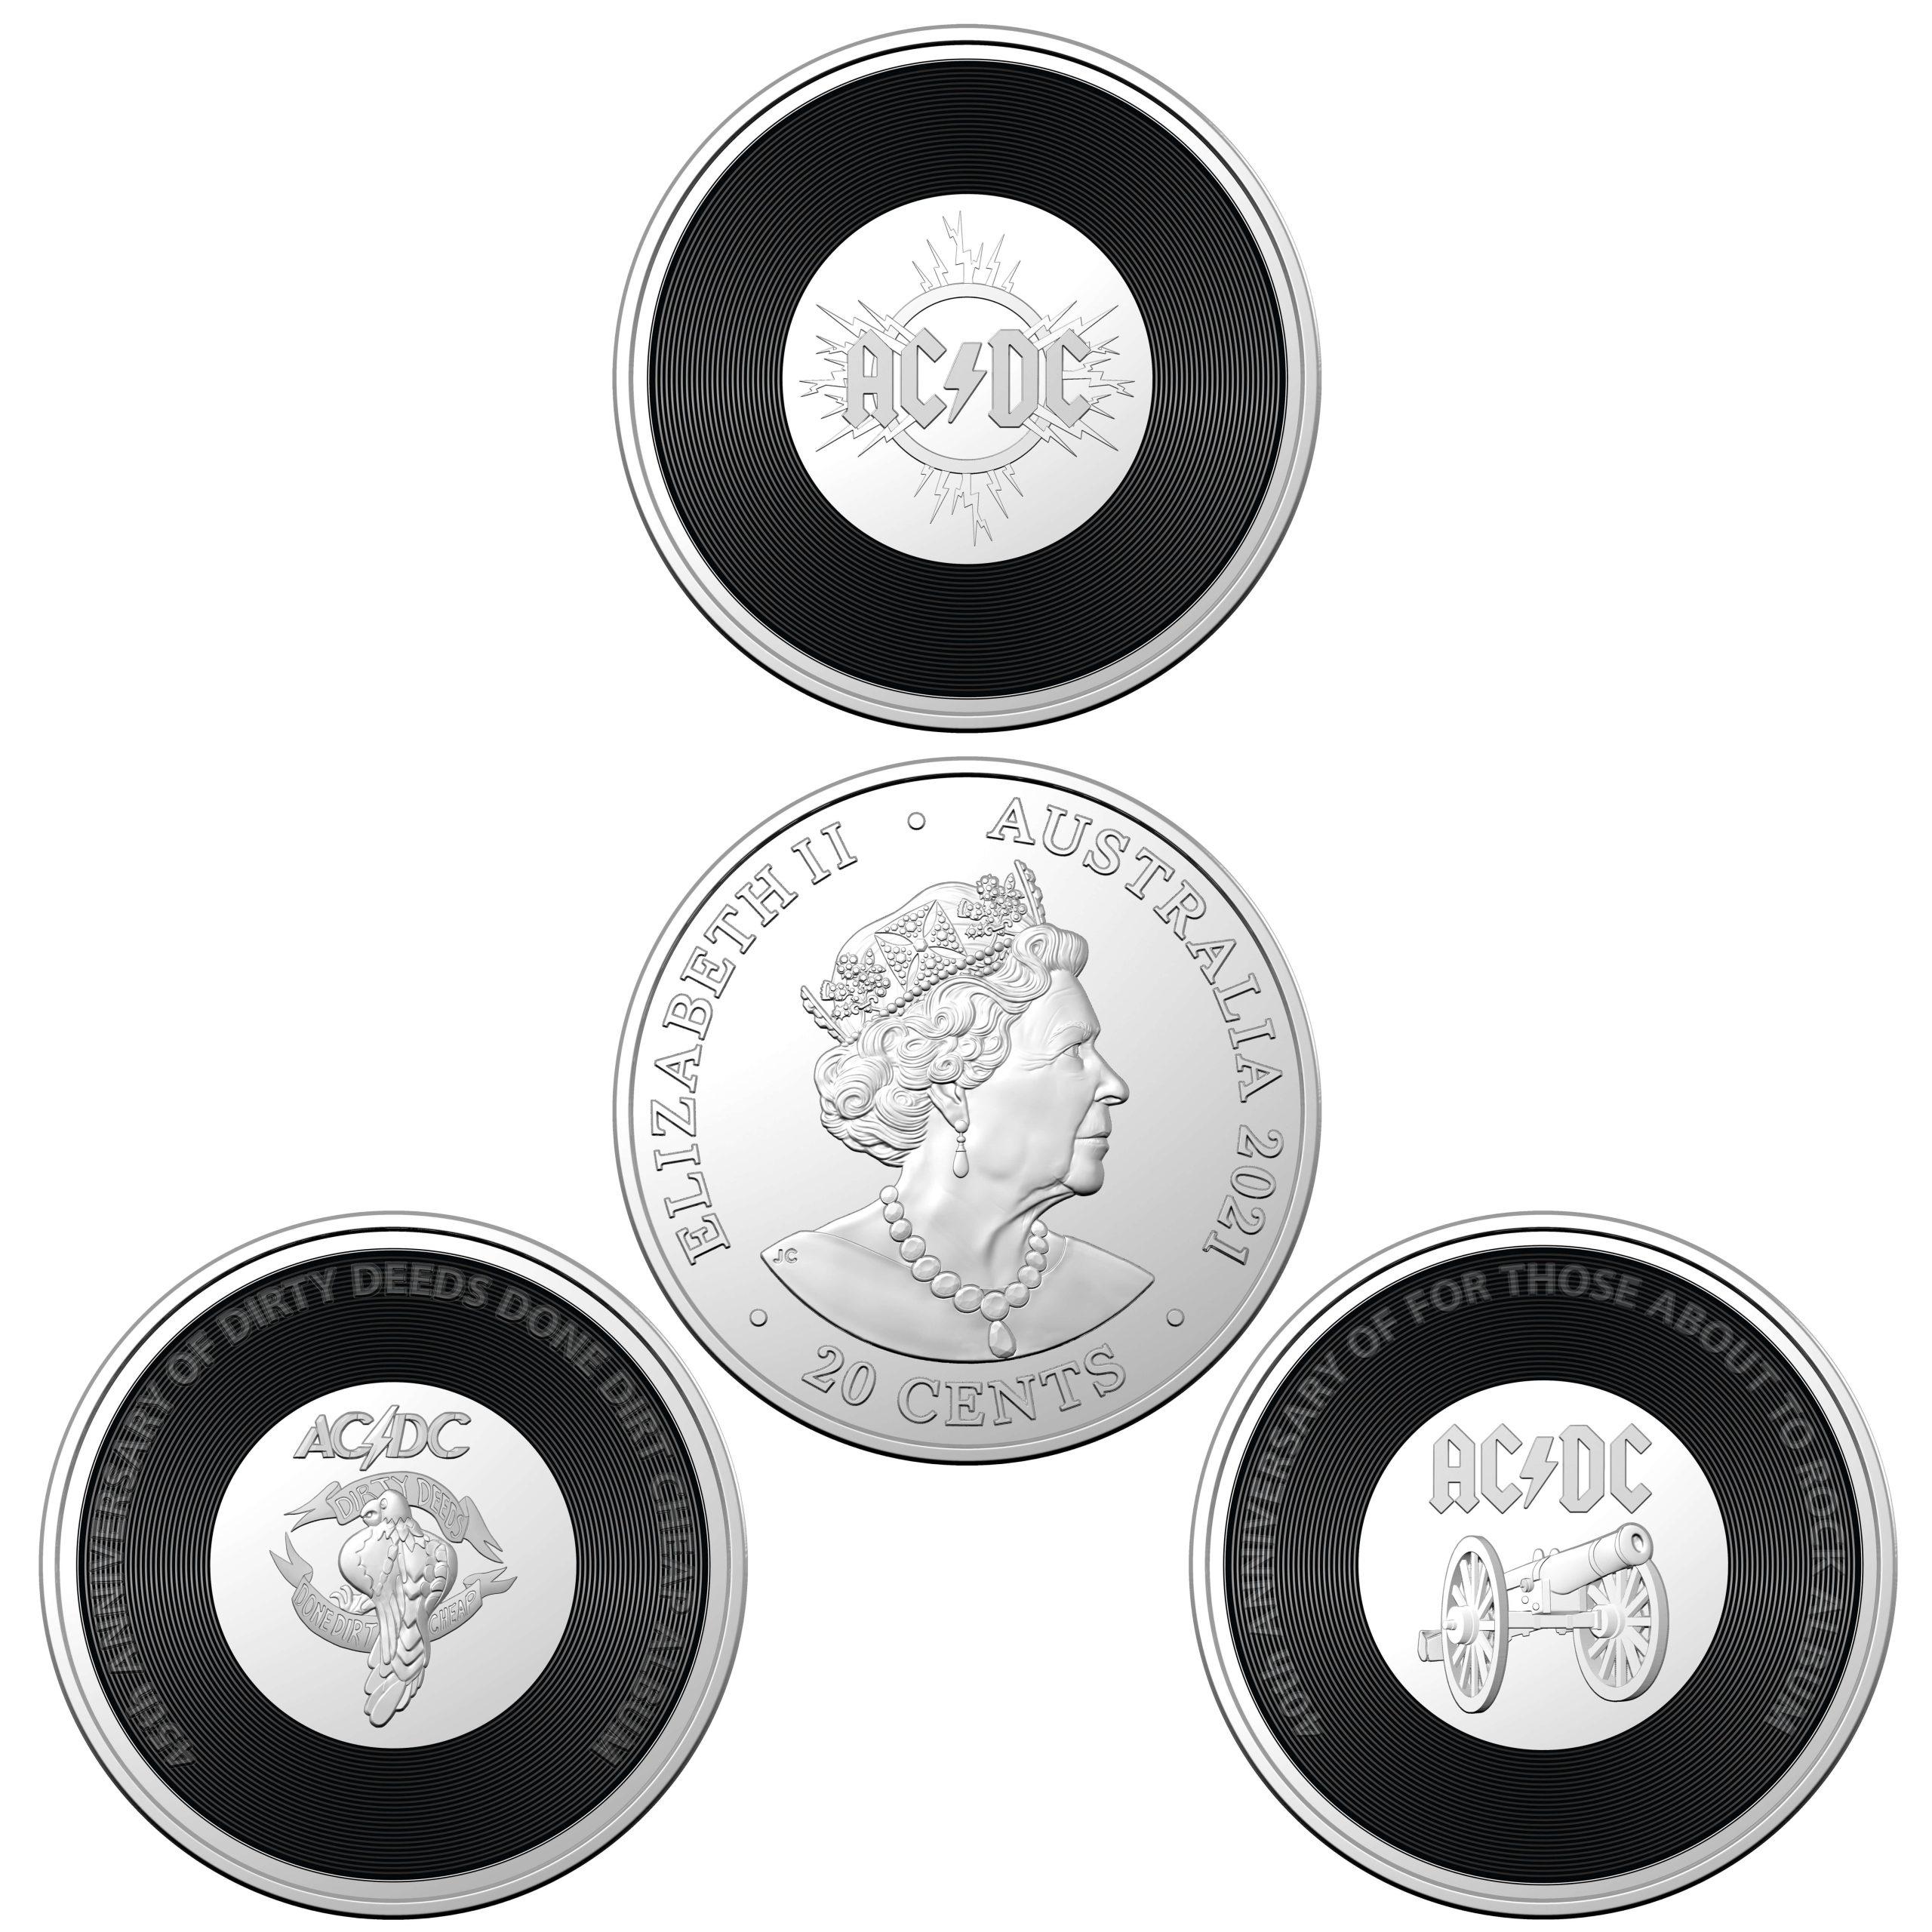 2020/2021 - AC/DC Seven Coin Collection - 20c Coloured CuNi Unc Coins 15